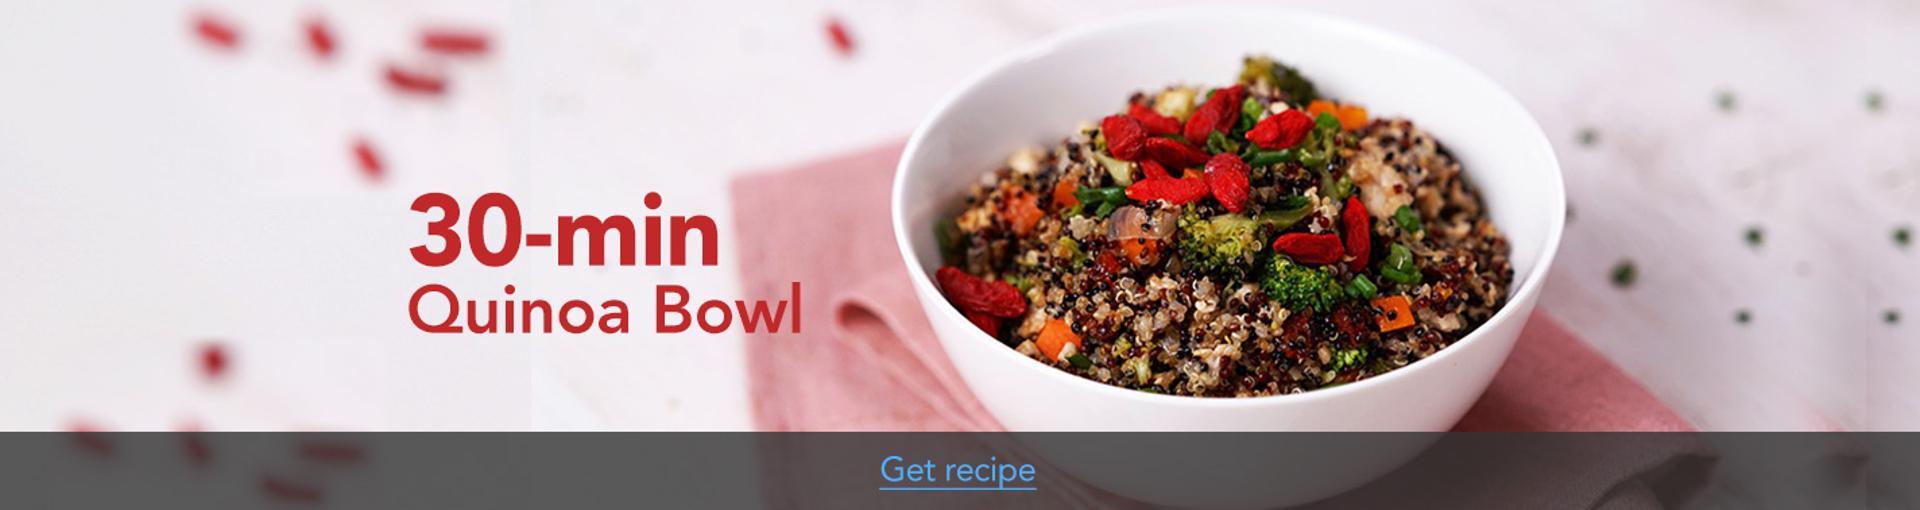 https://media.nedigital.sg/fairprice/images/1cf9c3dd-5a4e-4078-84f4-5d812811a494/Quinoa-Bowl-LandingBanner-Oct2020.jpg